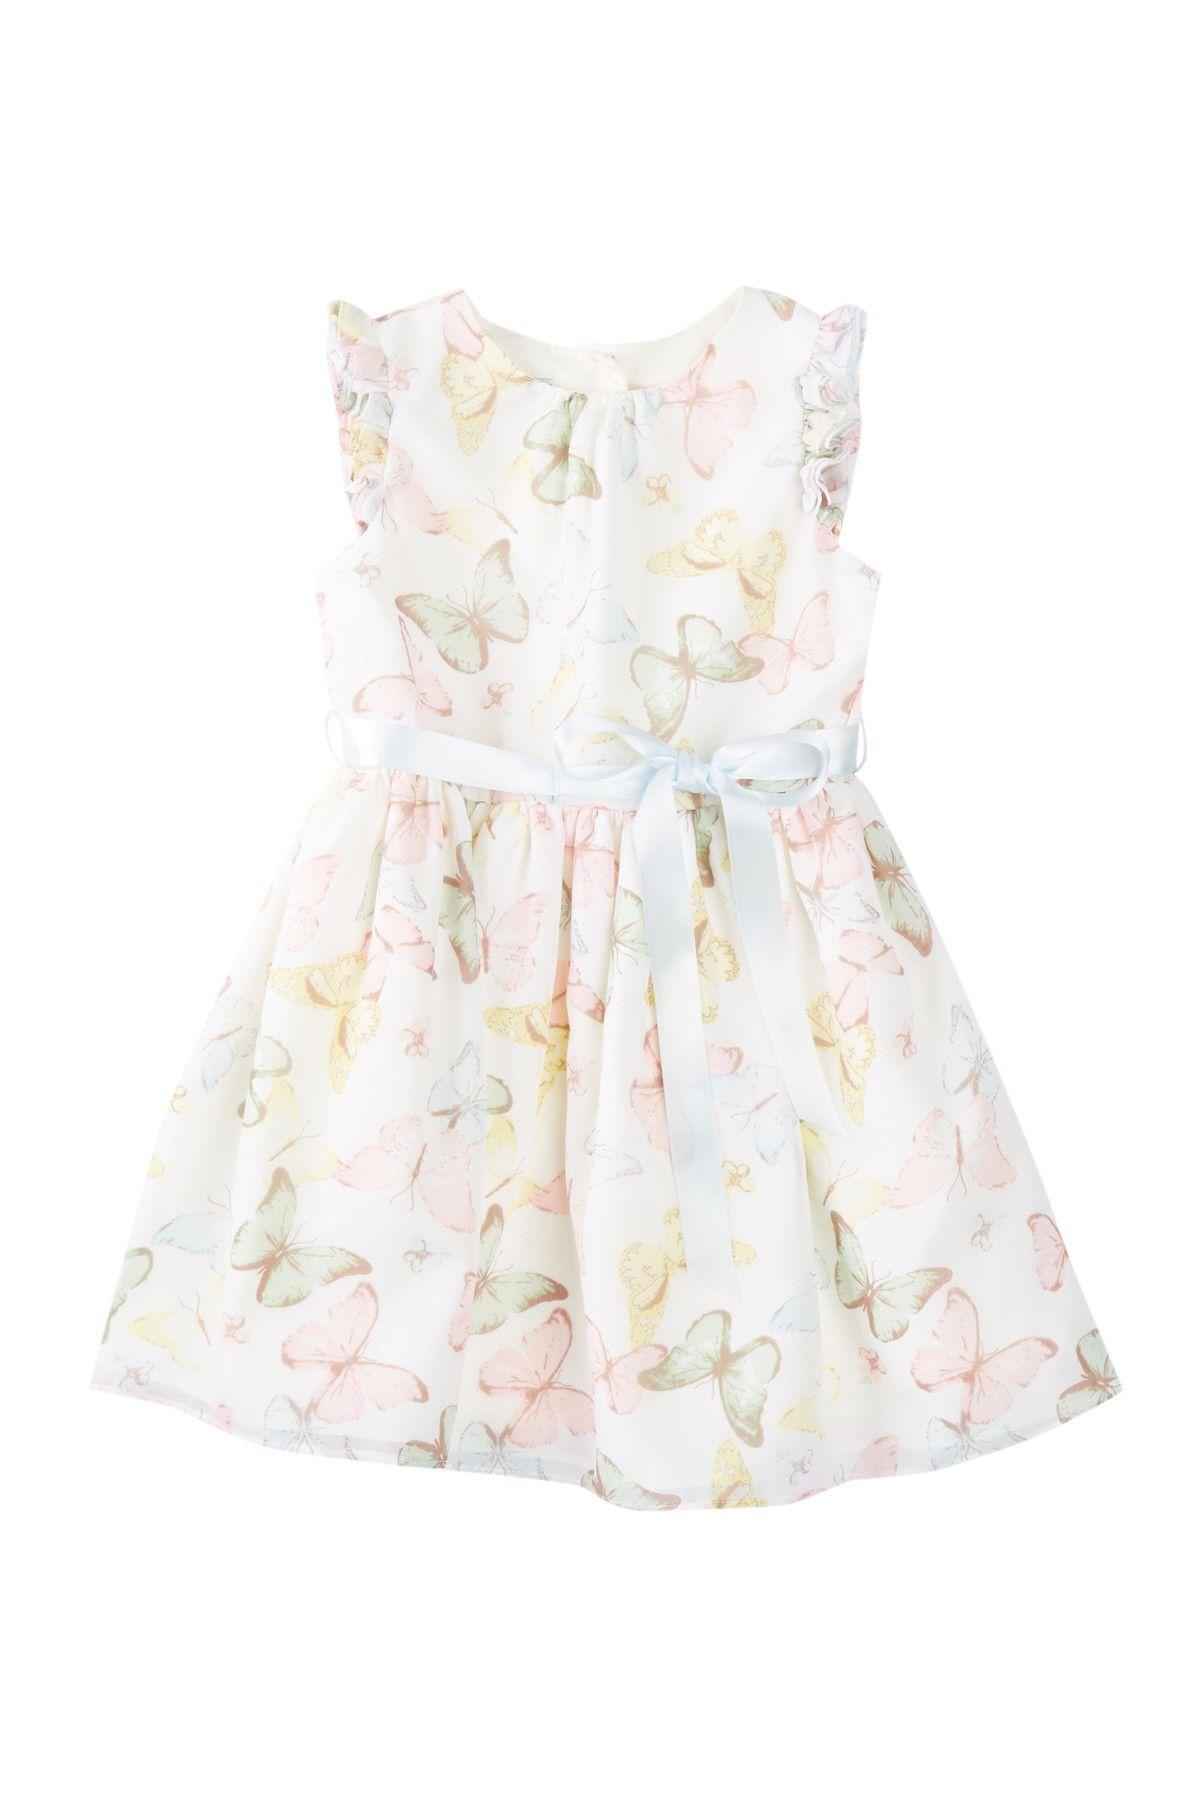 Butterfly Chiffon Print Dress Toddler Girls